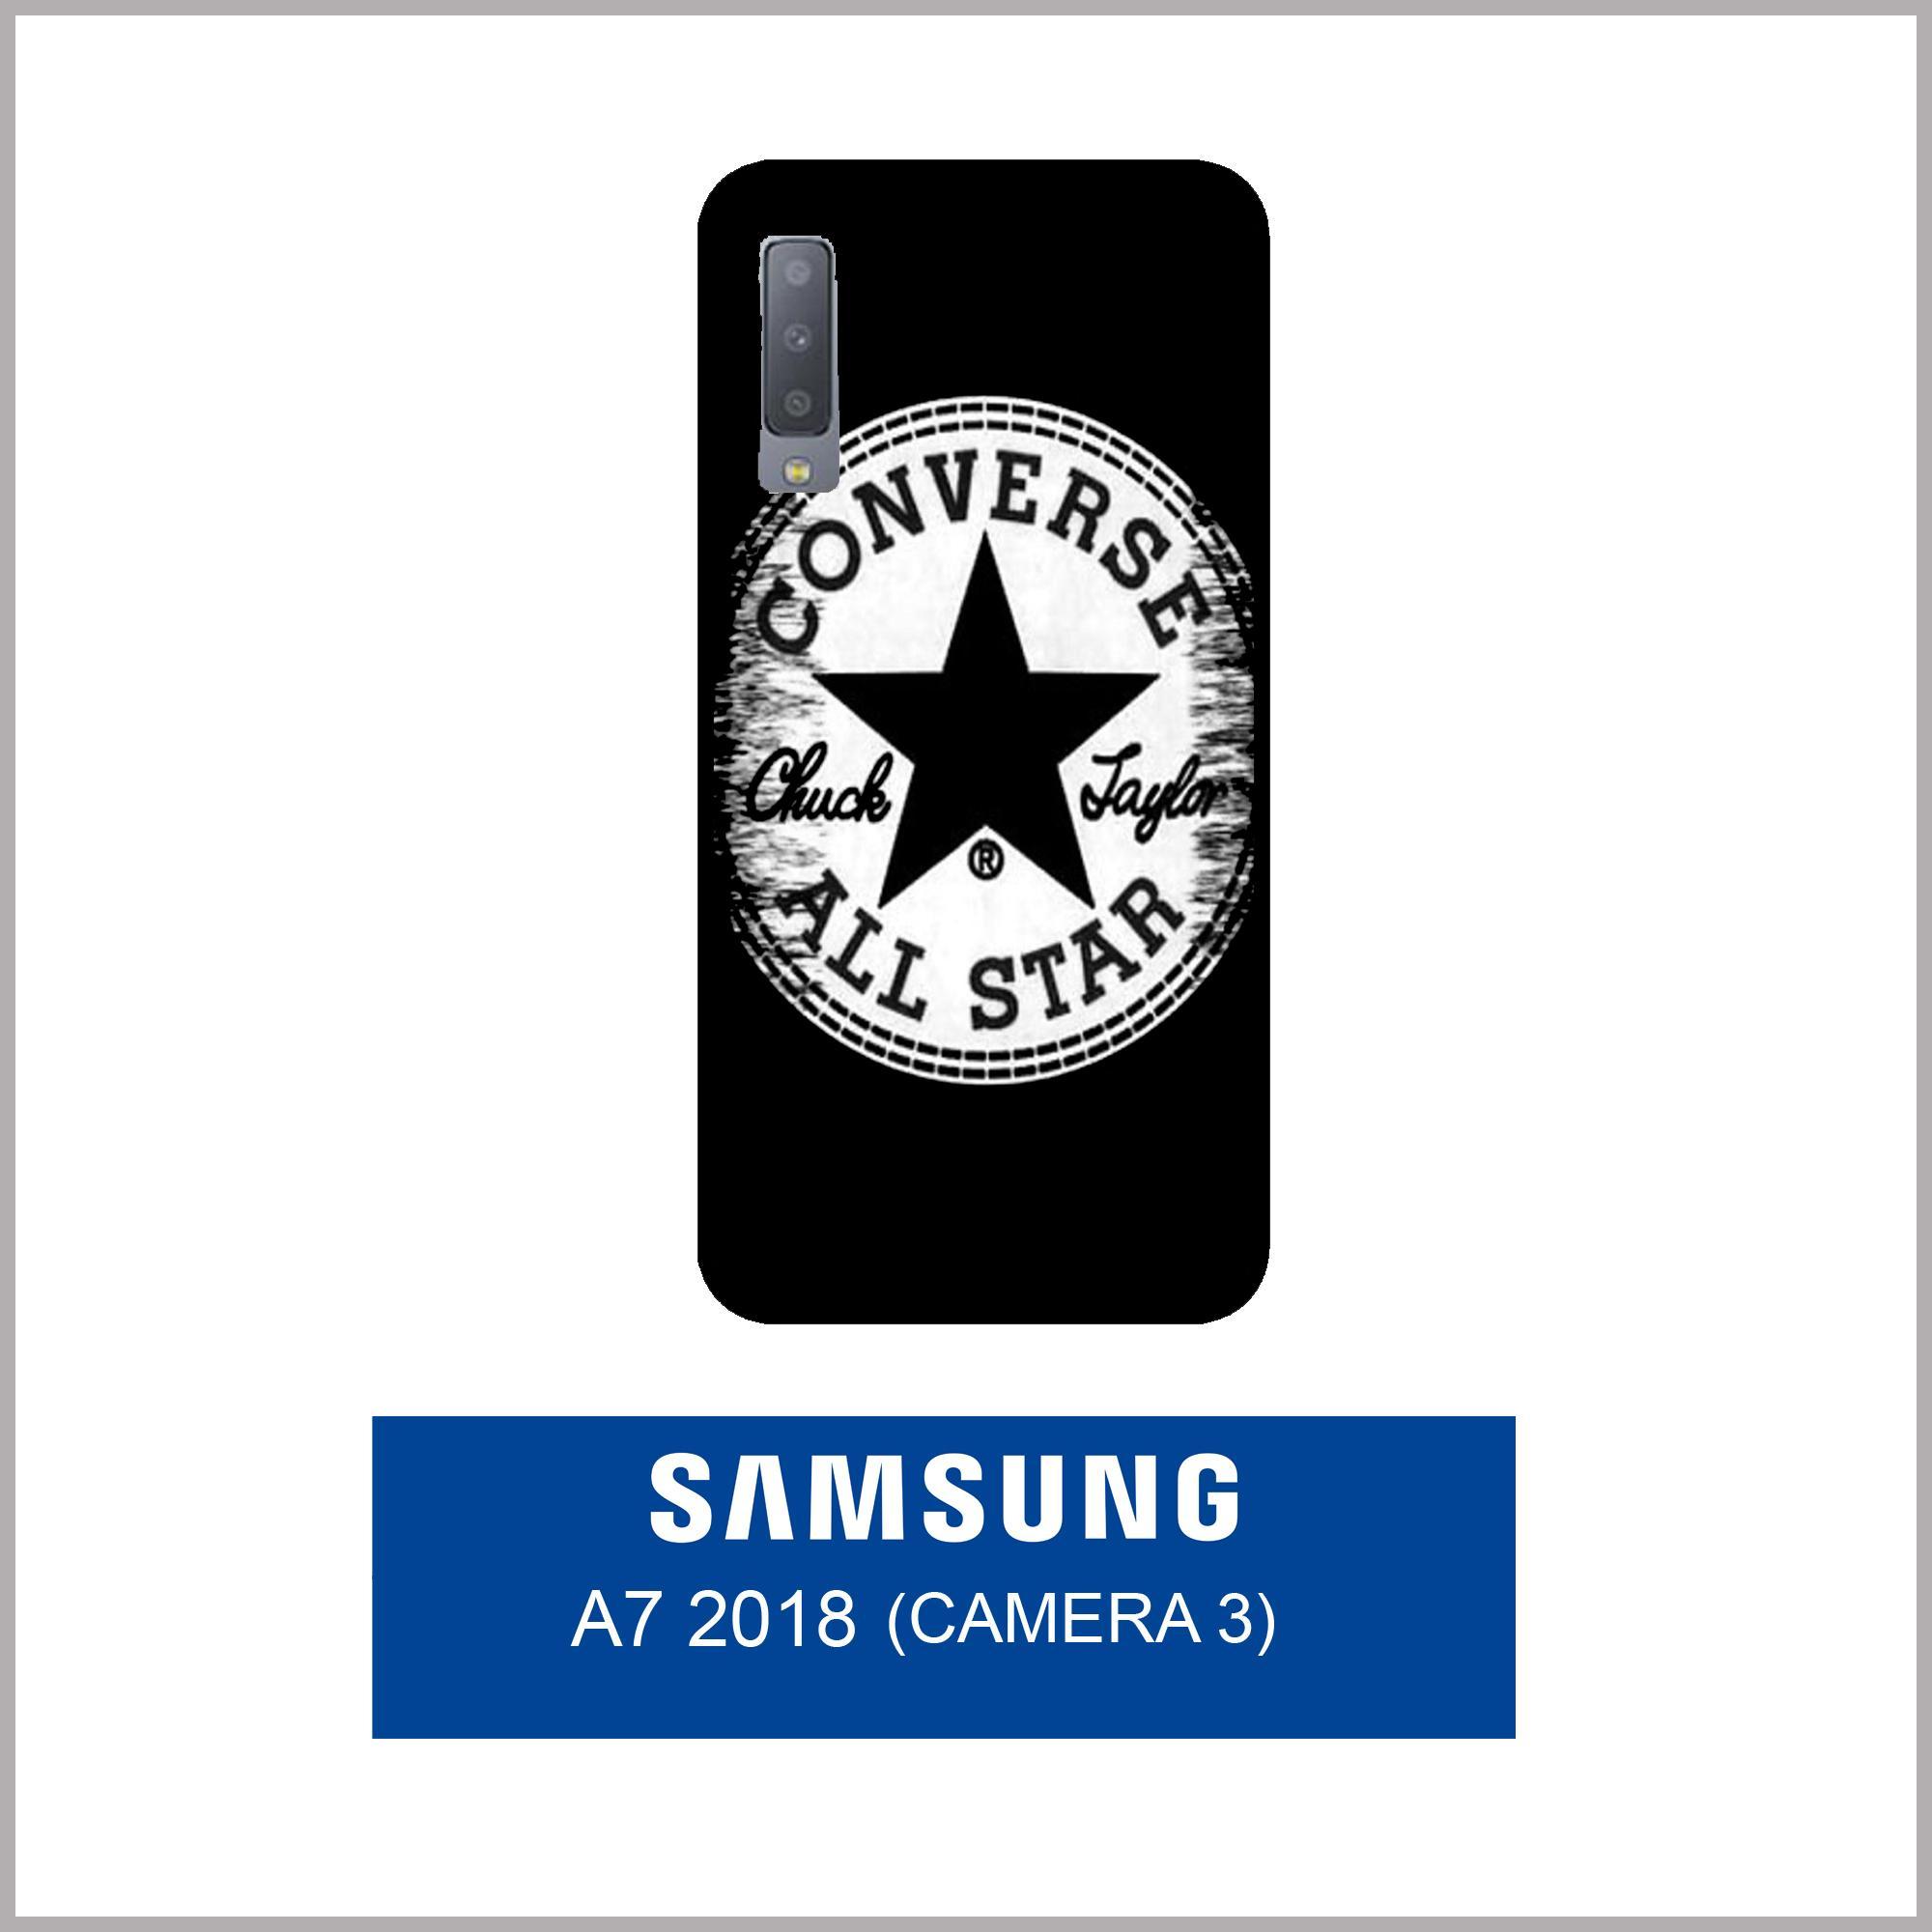 Rajamurah fasion printing case Samsung A7 2018 - 13 (camera 3)